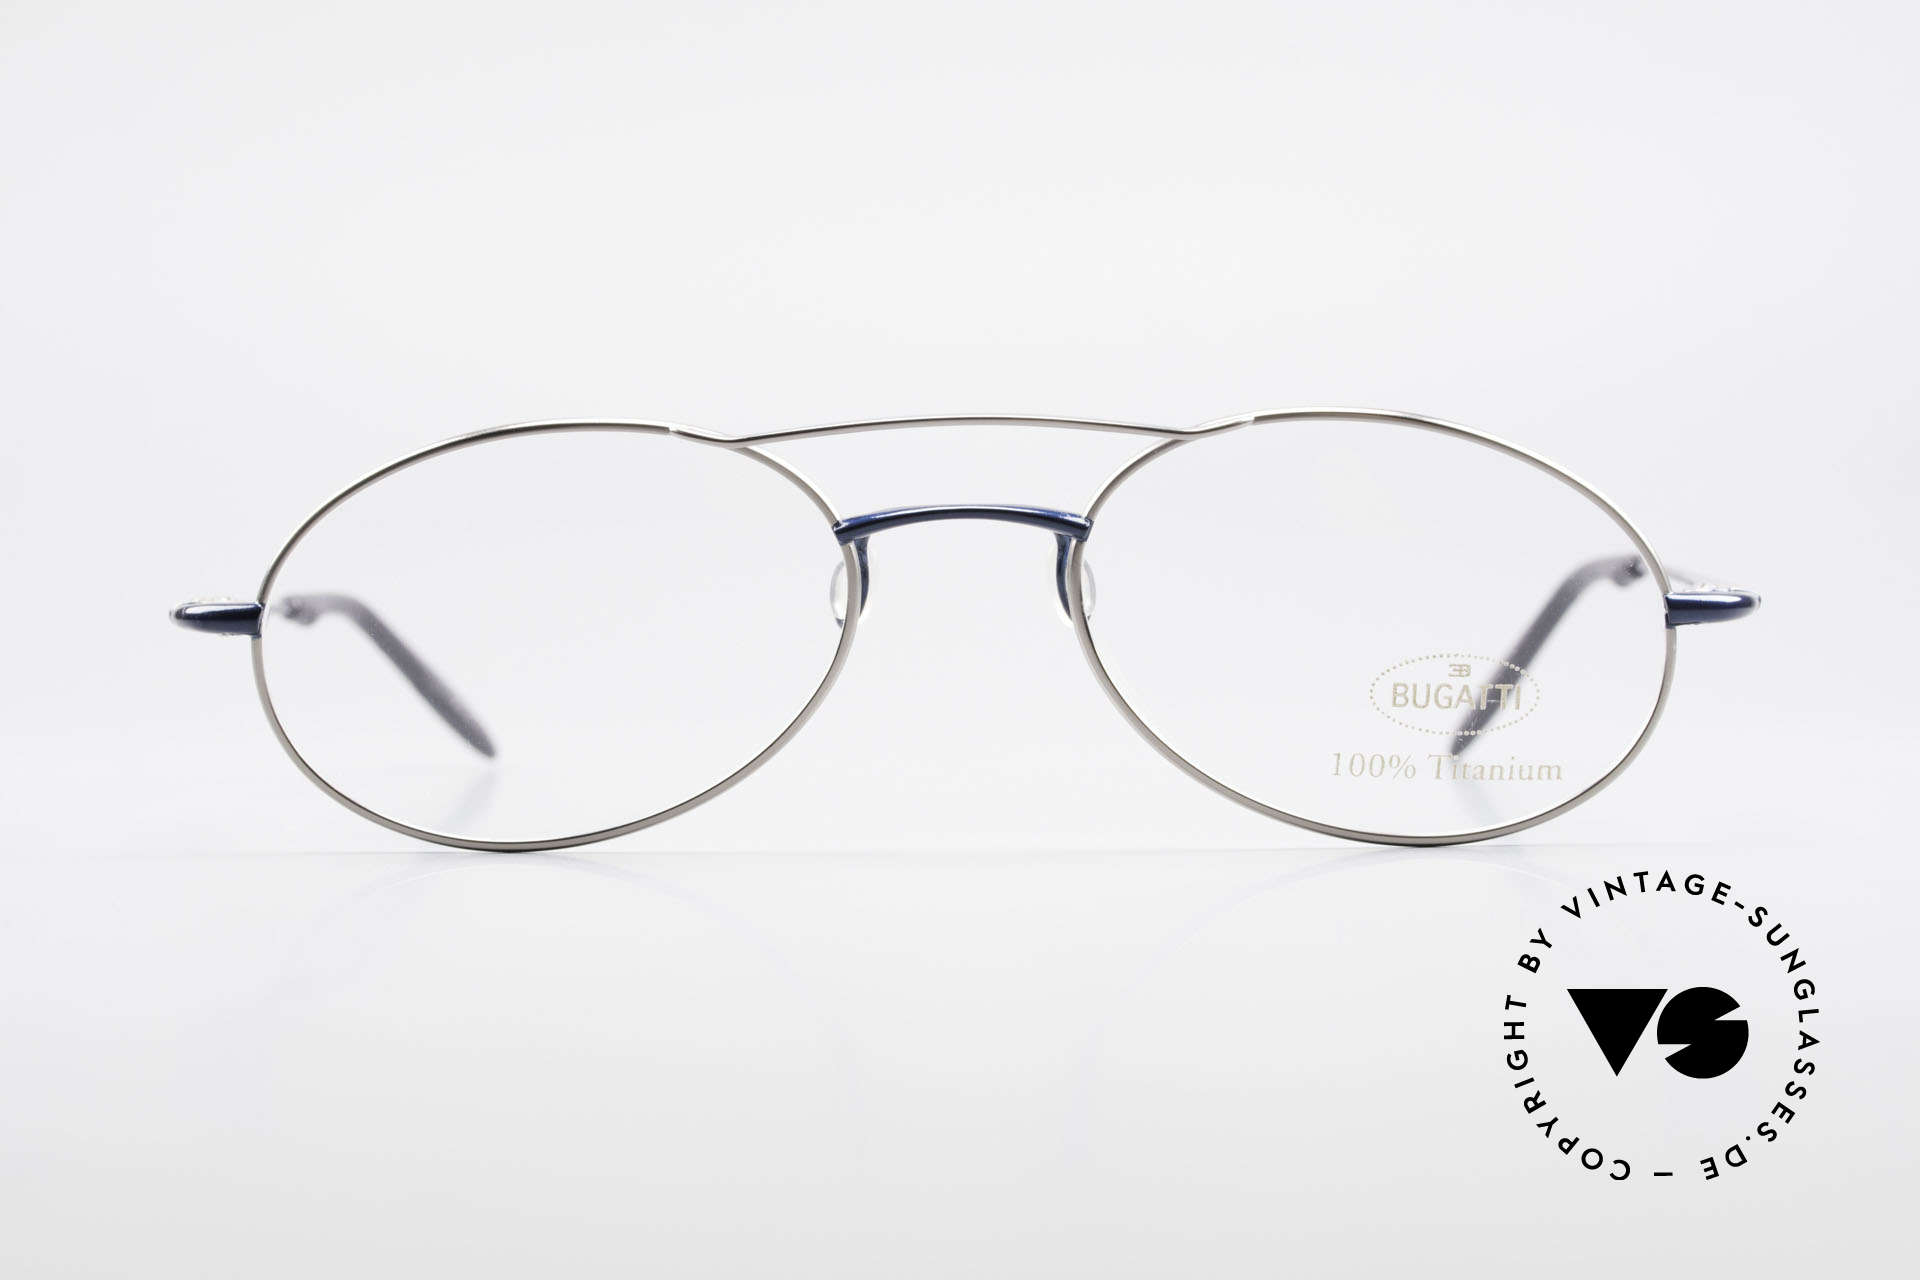 Bugatti 19239 Titanium Luxury Eyeglasses, outstanding craftsmanship (lightweight 15g frame), Made for Men